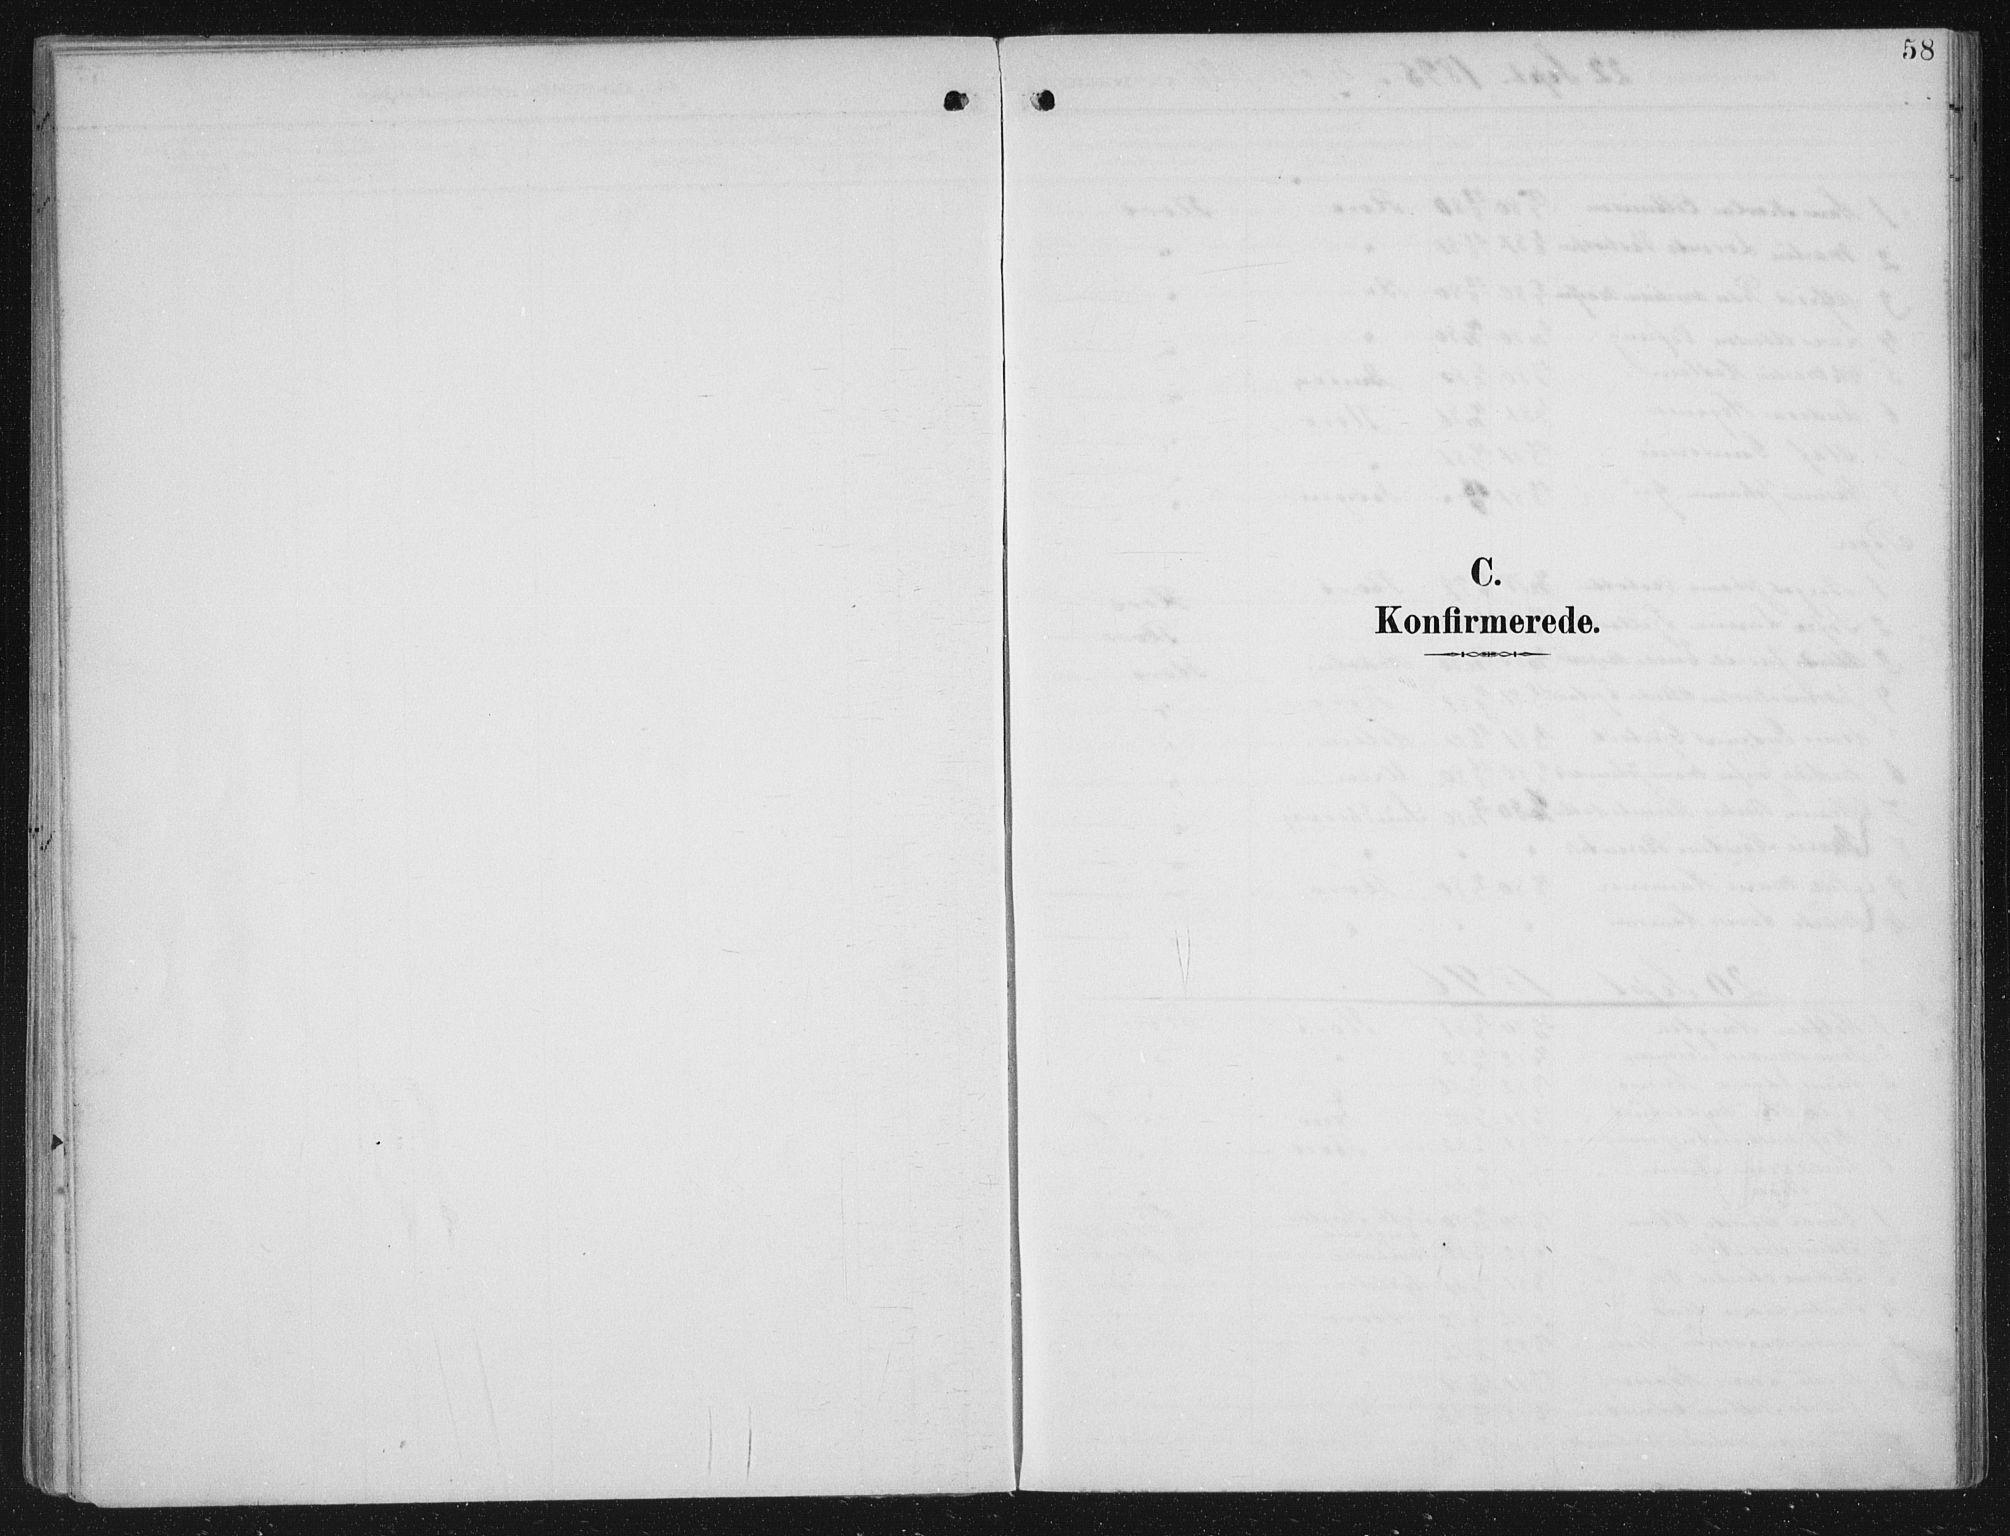 SAB, Kinn sokneprestembete, H/Haa/Haac/L0002: Ministerialbok nr. C  2, 1895-1916, s. 58